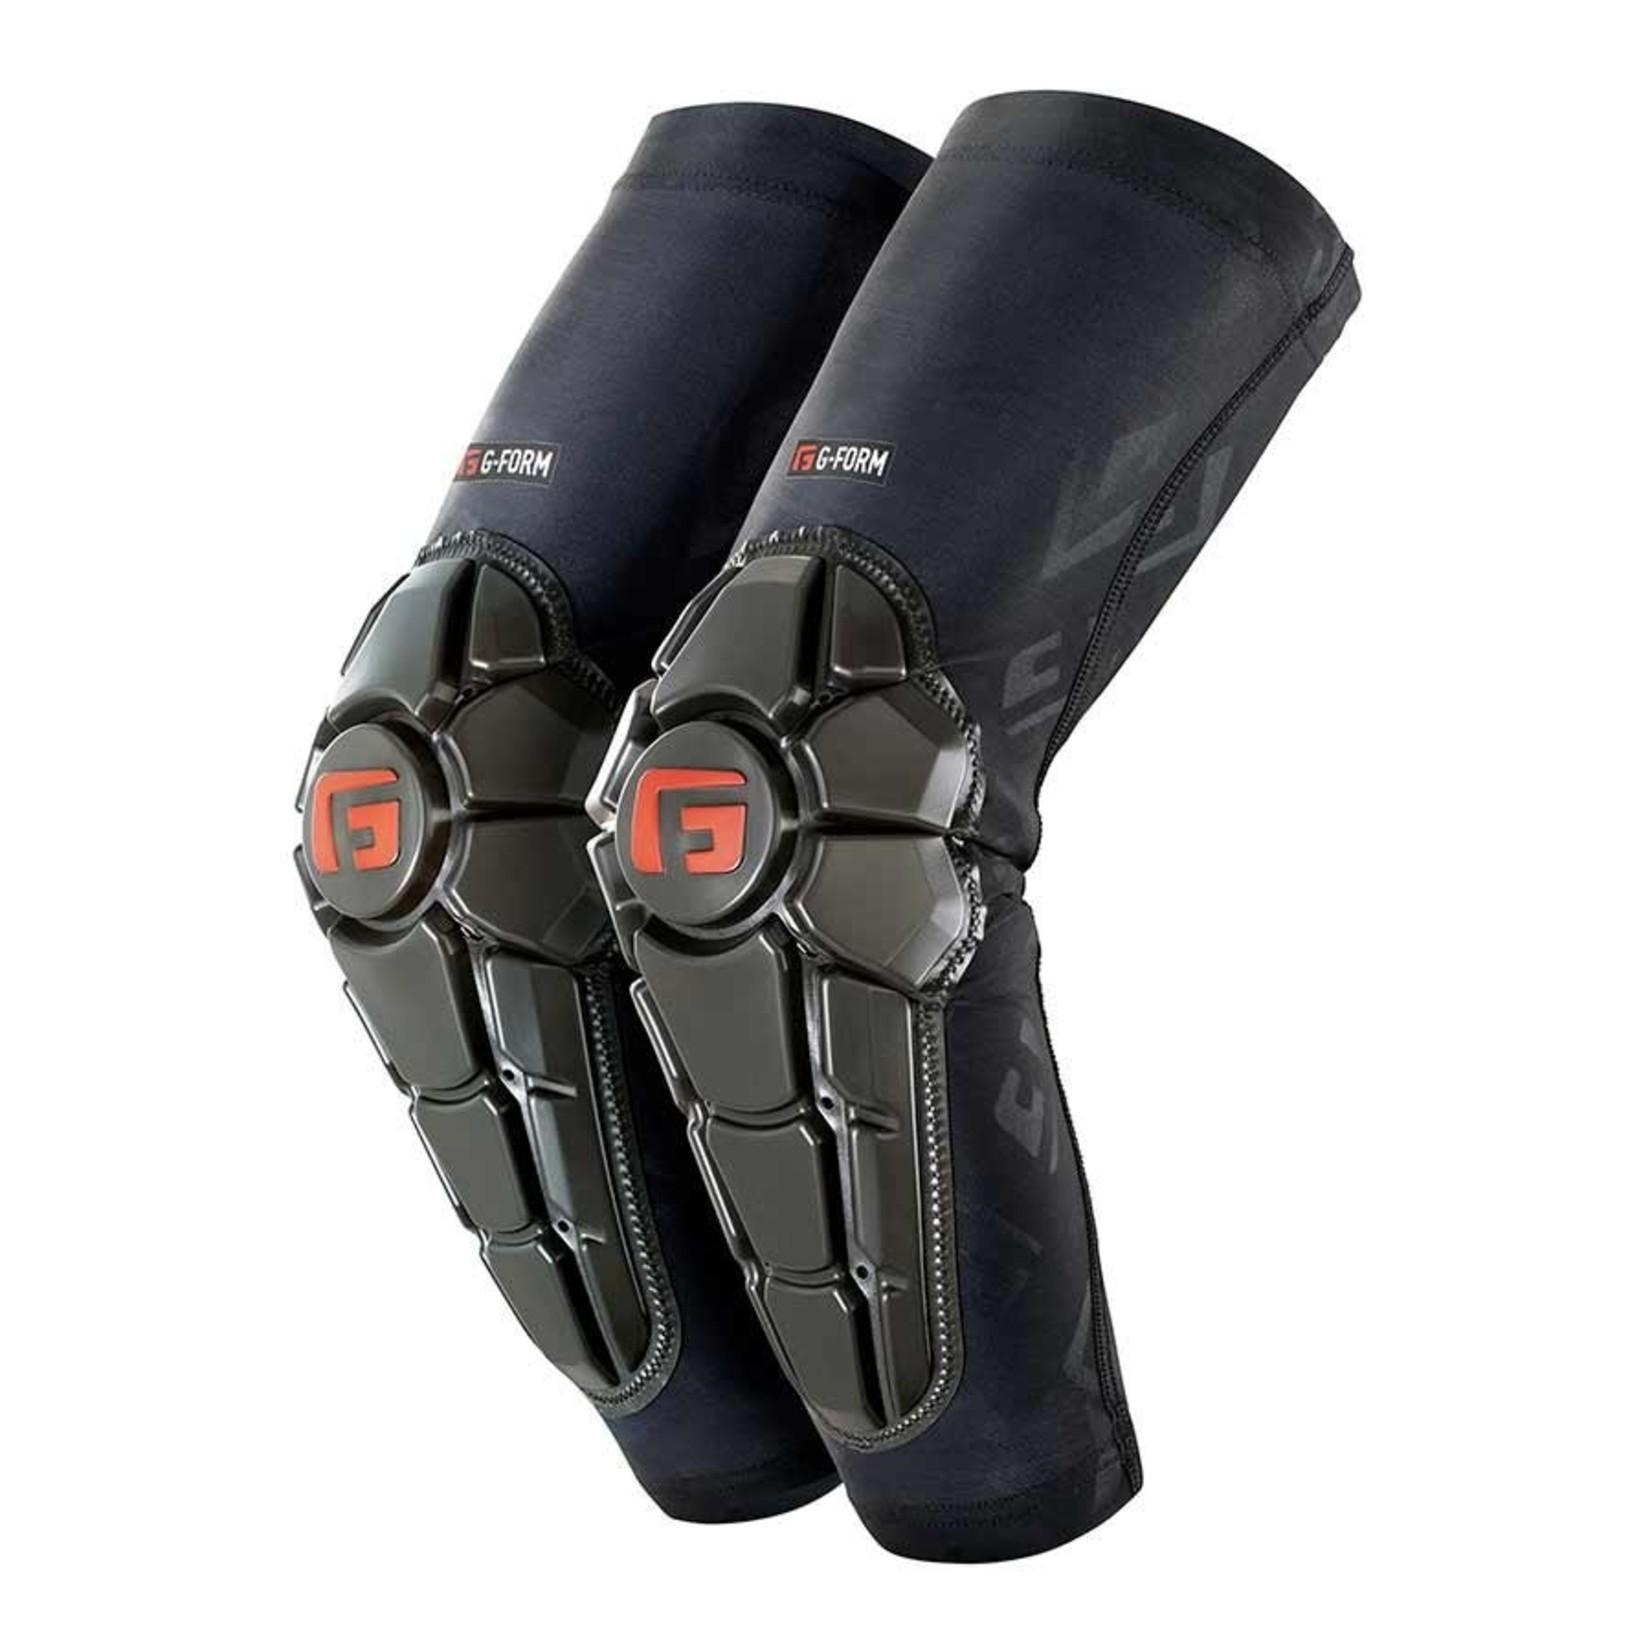 G-Form G-Form, Youth Pro-X2, Elbow/Forearm Guard, Black, LXL, Set